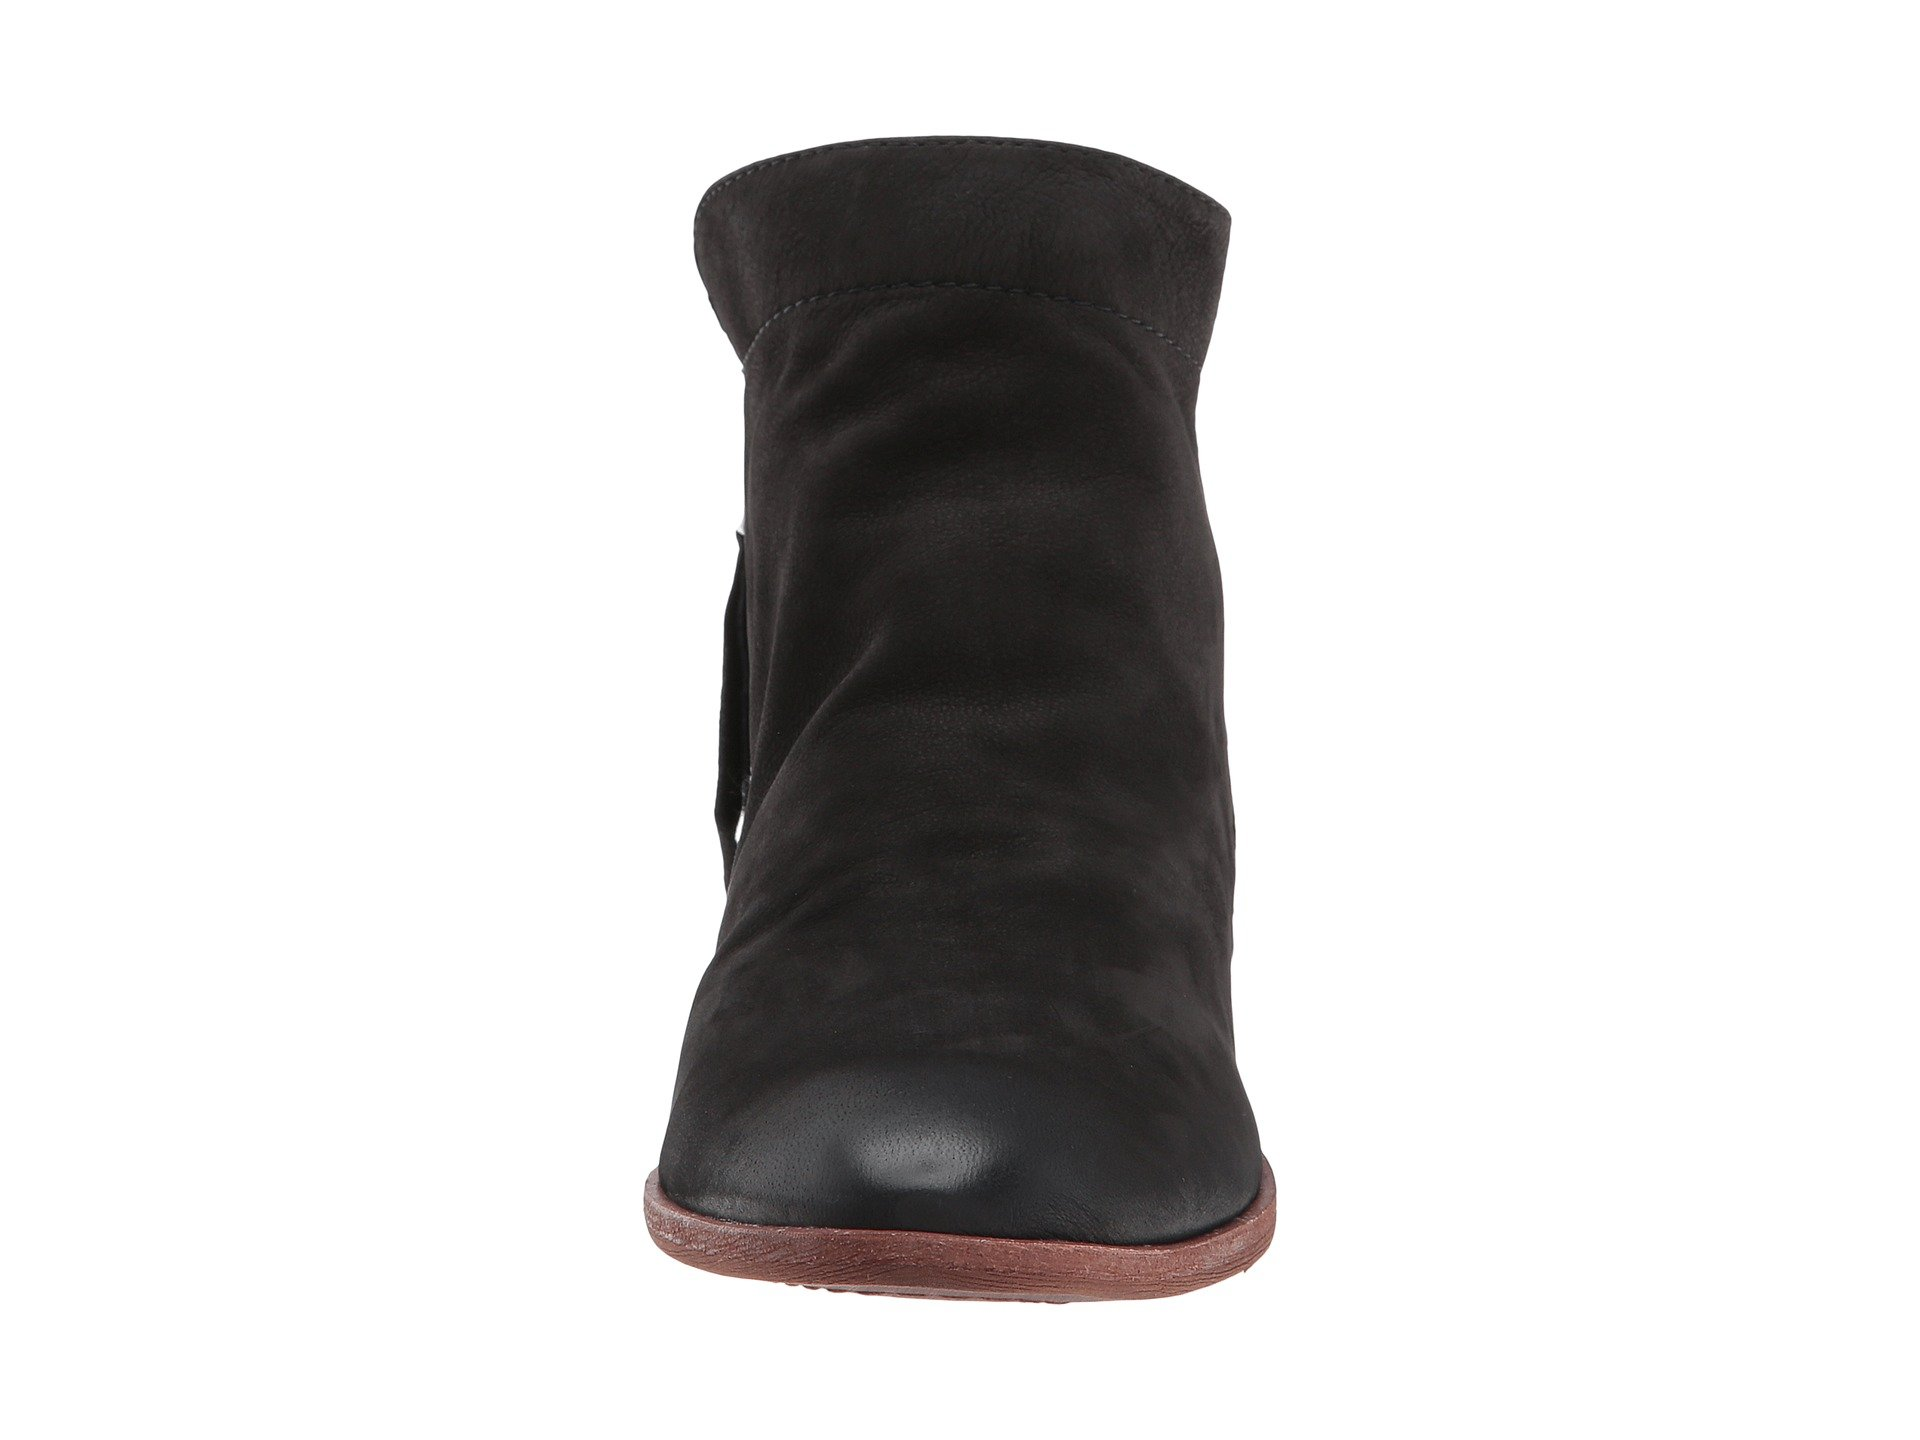 Packer Sam Black Edelman Waxy Leather Nubuck 5zzZqrU